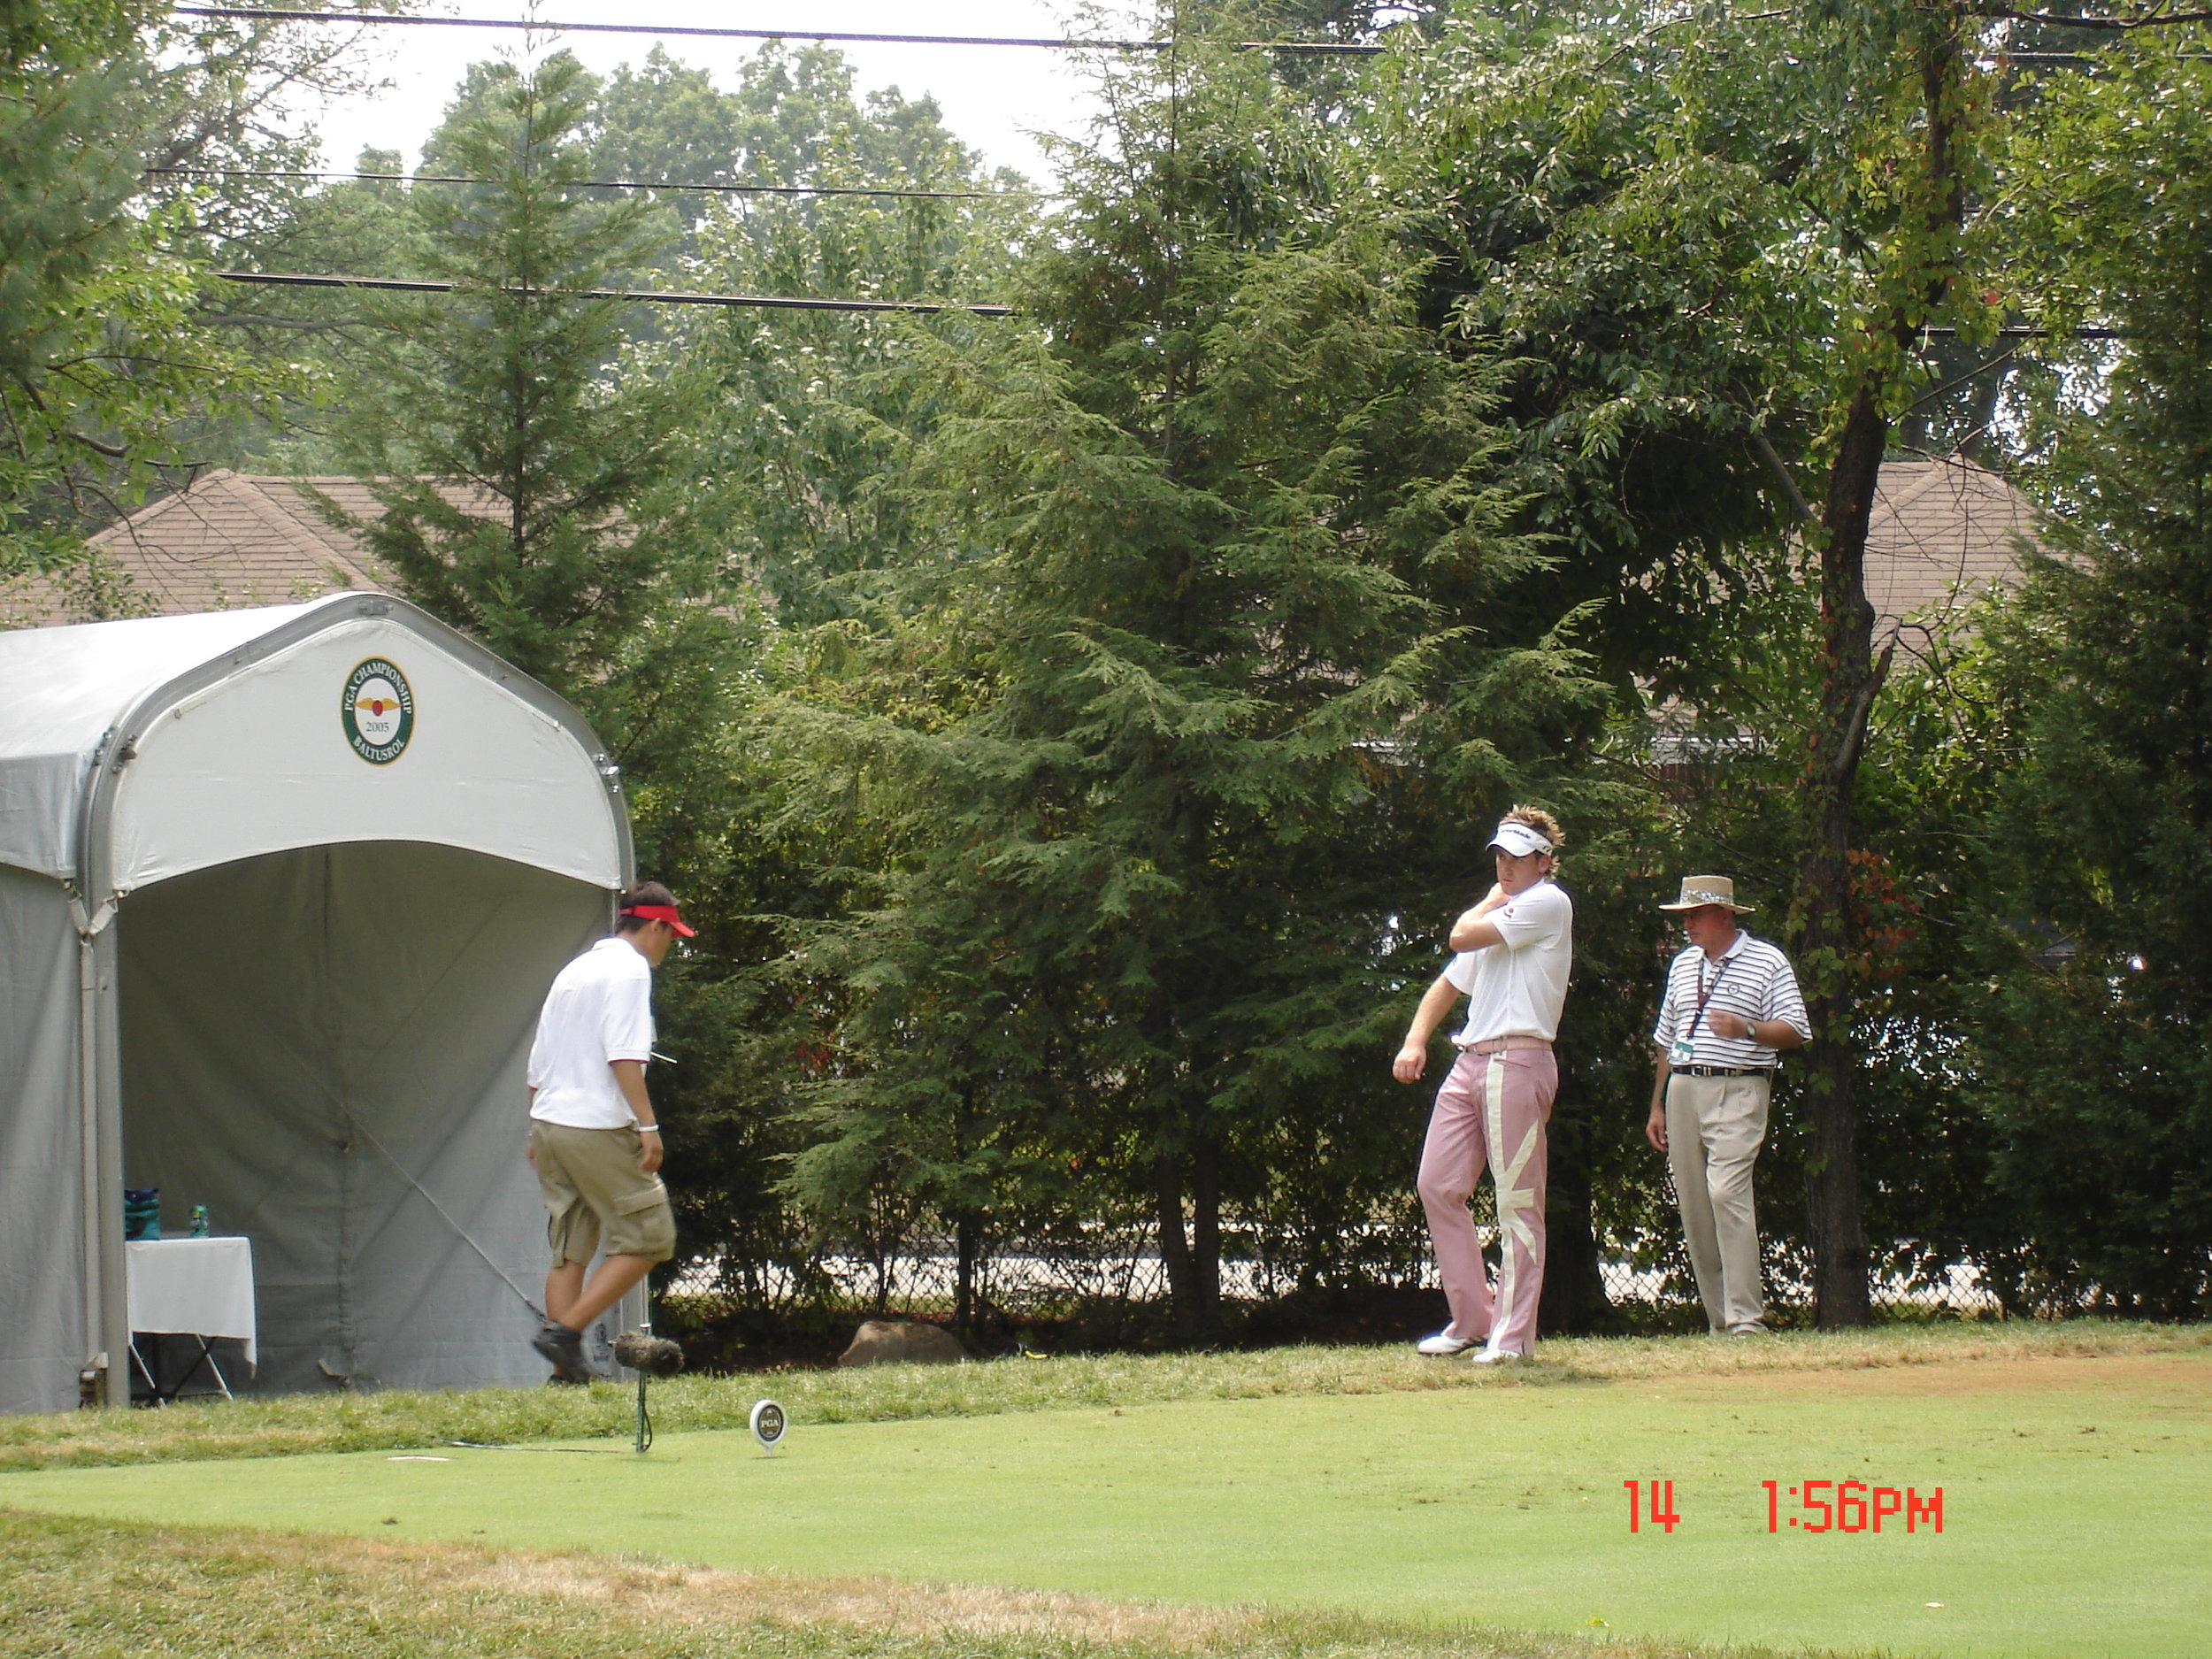 PGA BaltusrolDSC00339.jpg